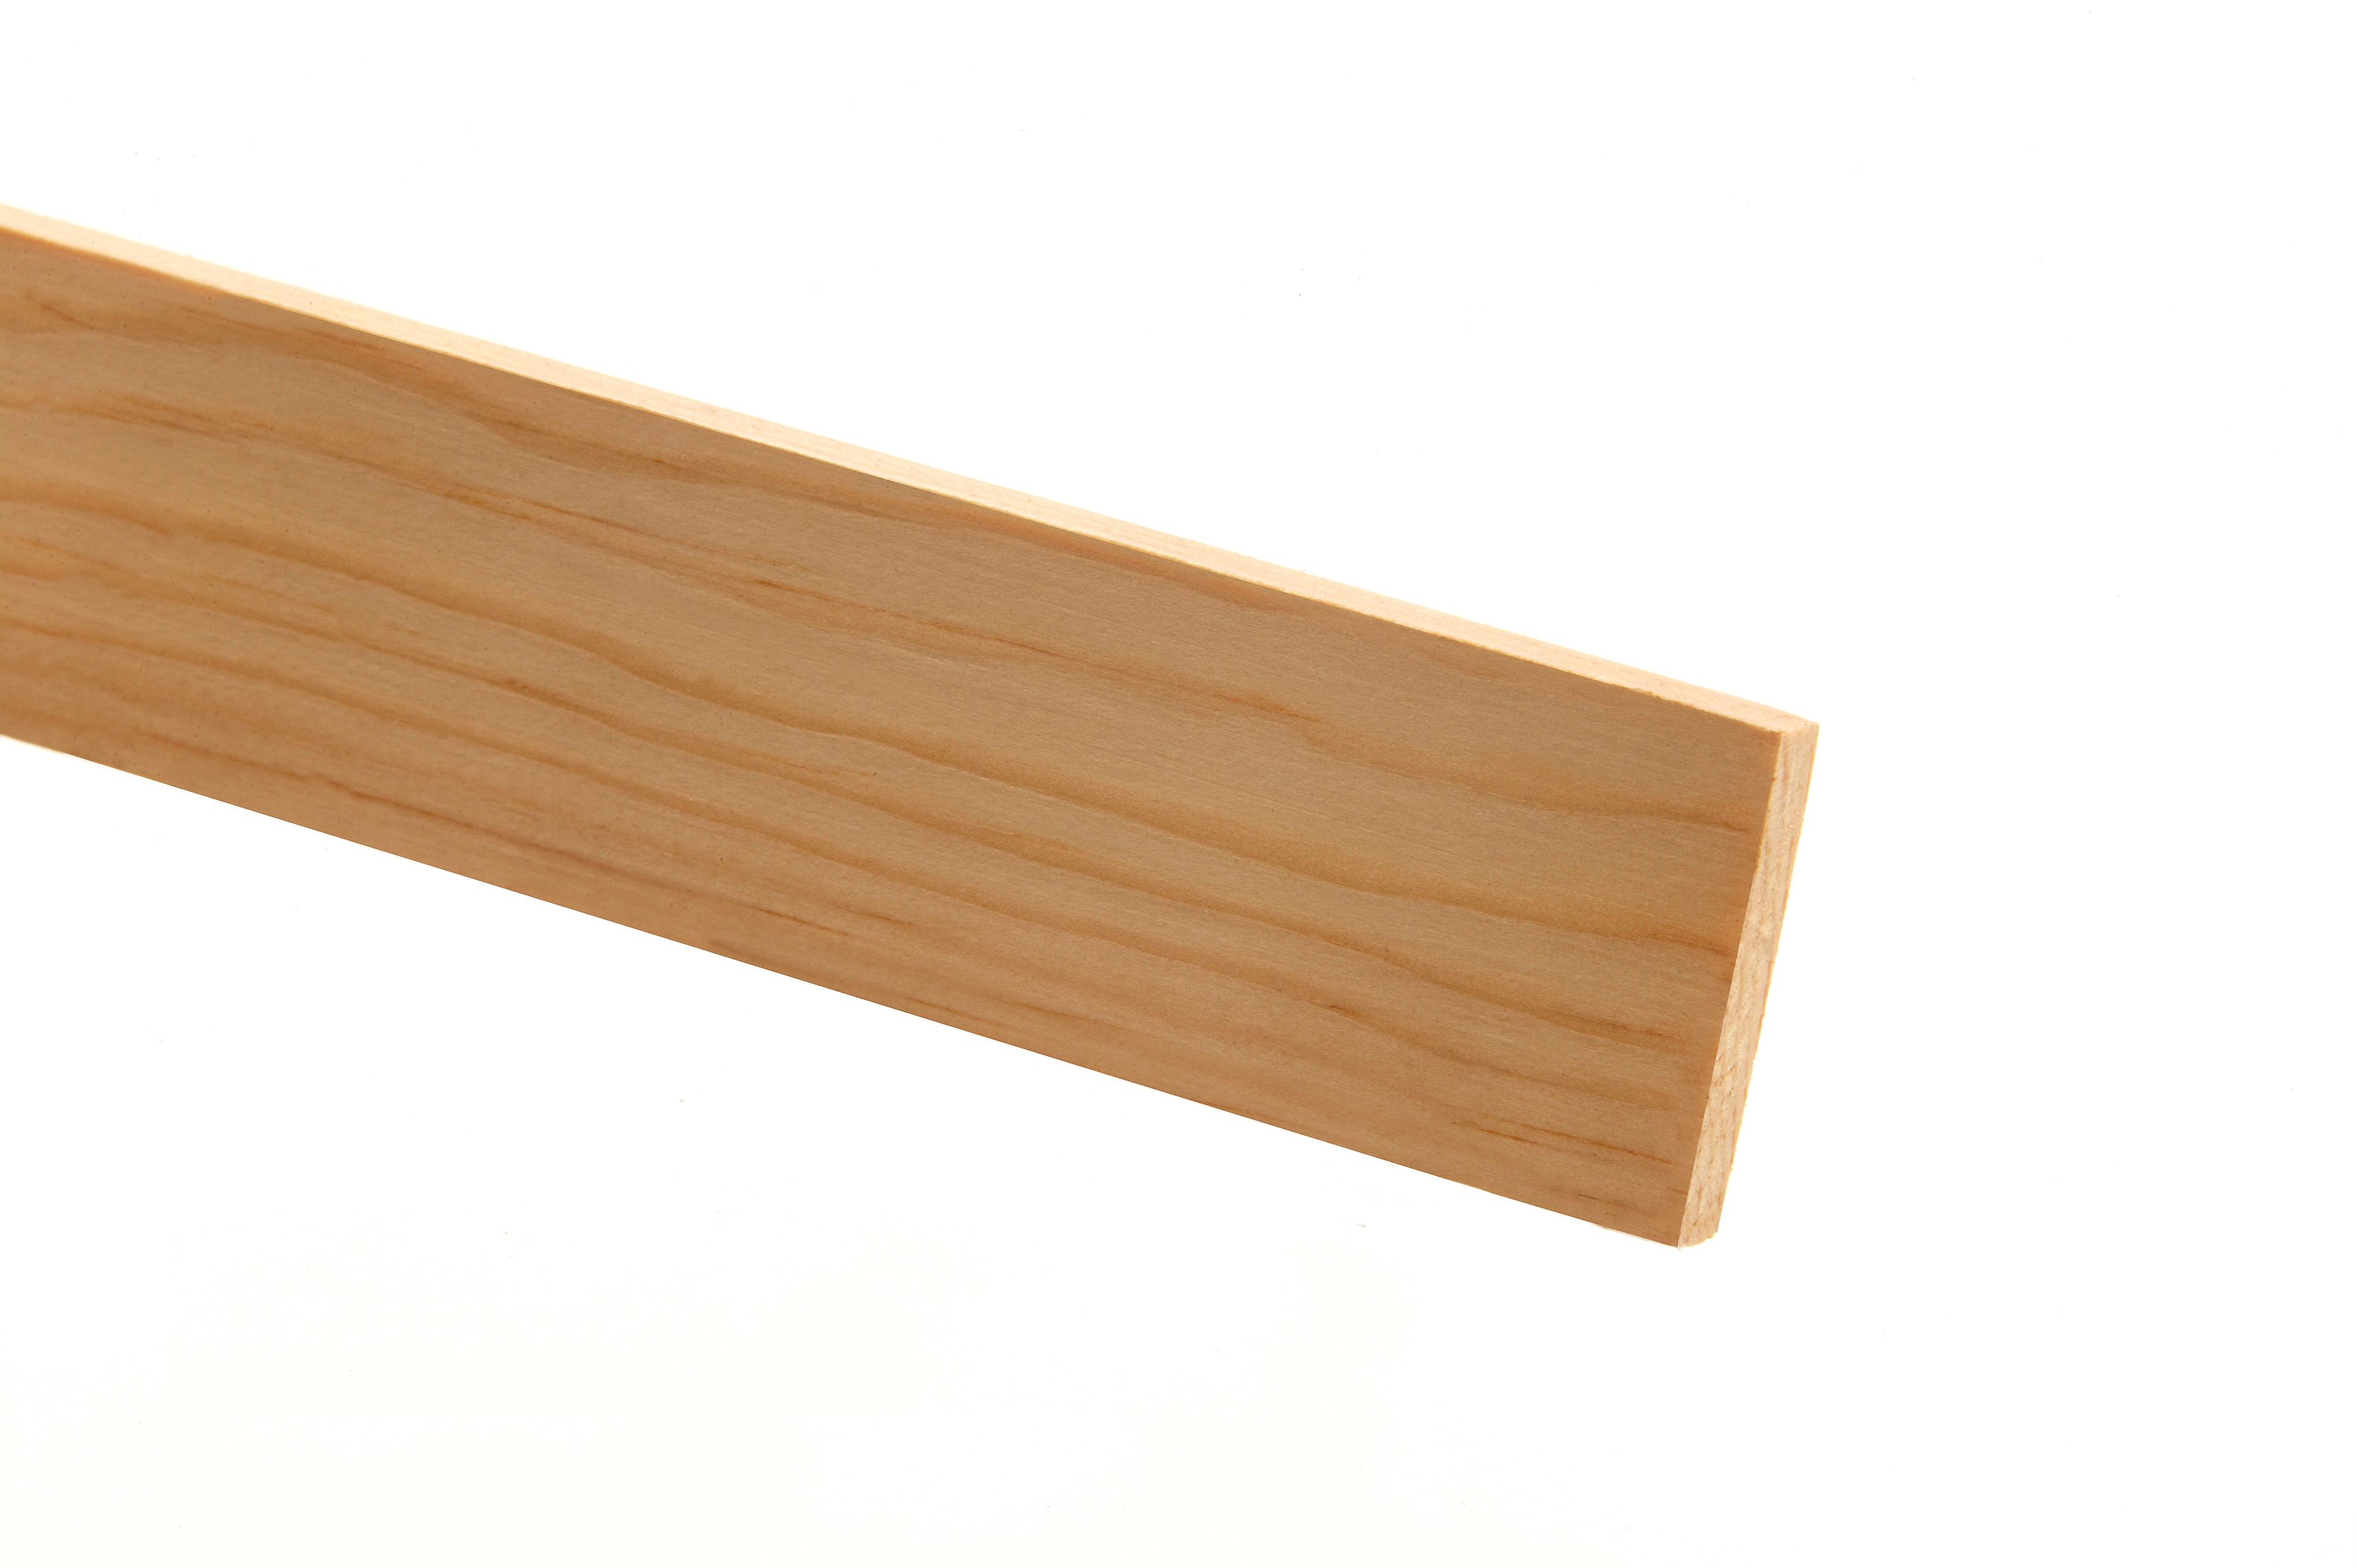 20 Pine PSE Stripwood 4 x 28 x 2400mm